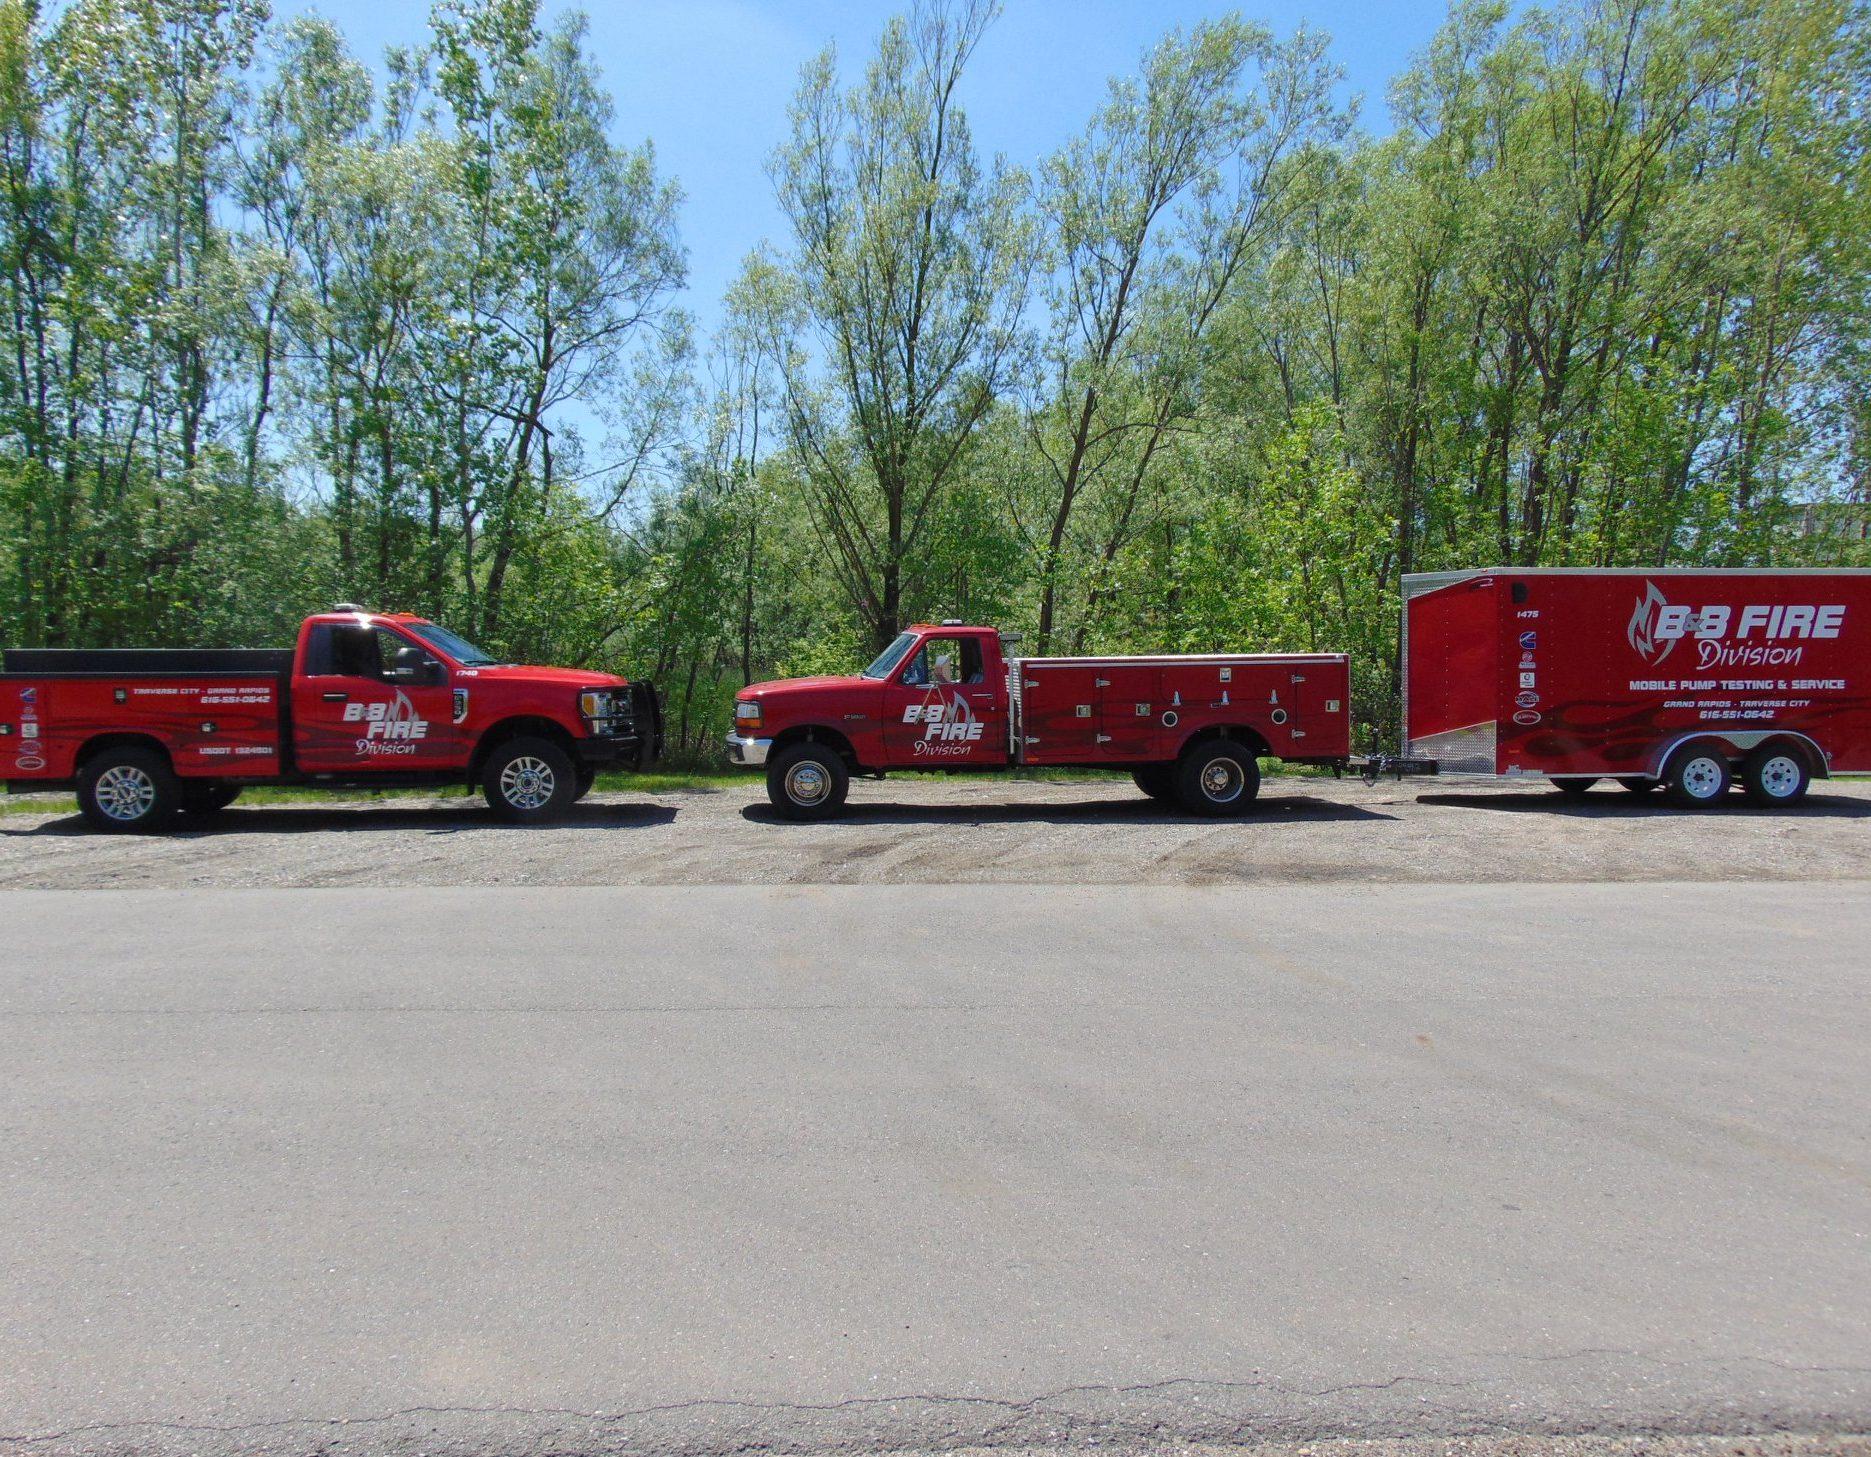 Mobile service b&b fire